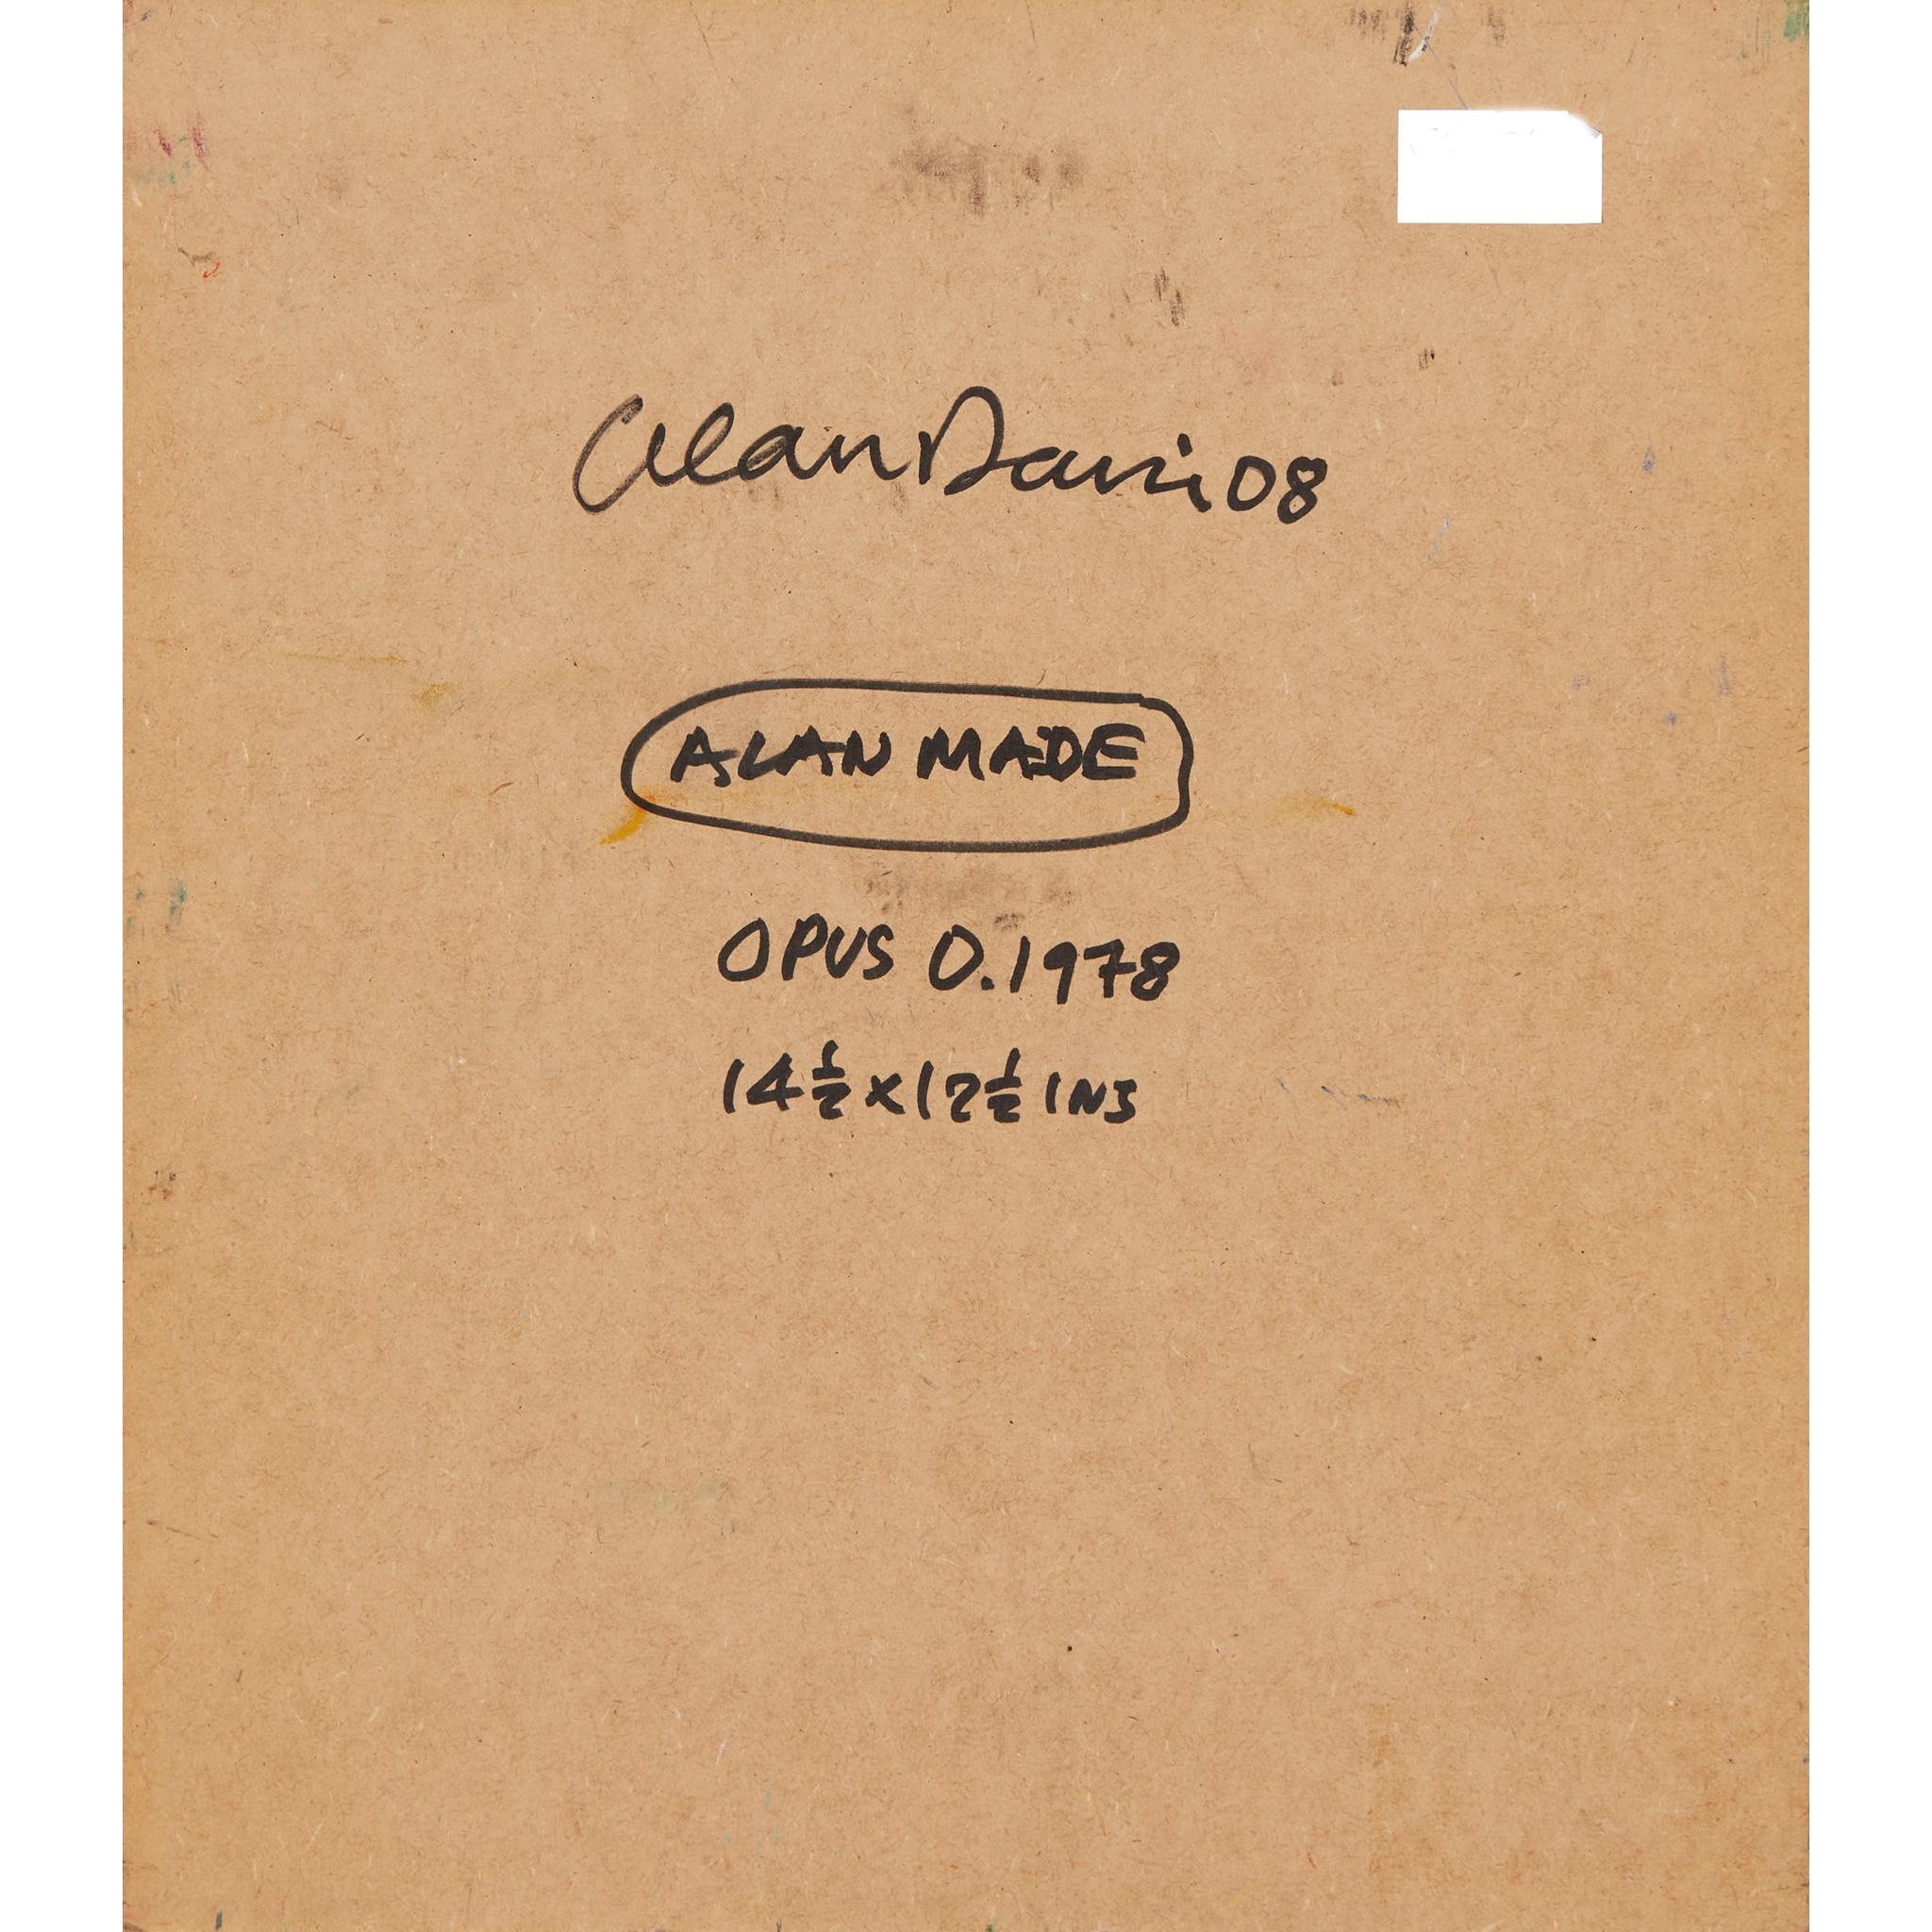 § ALAN DAVIE C.B.E., R.A., H.R.S.A. (BRITISH 1920-2014) ALAN MADE, 2008 - Image 2 of 2